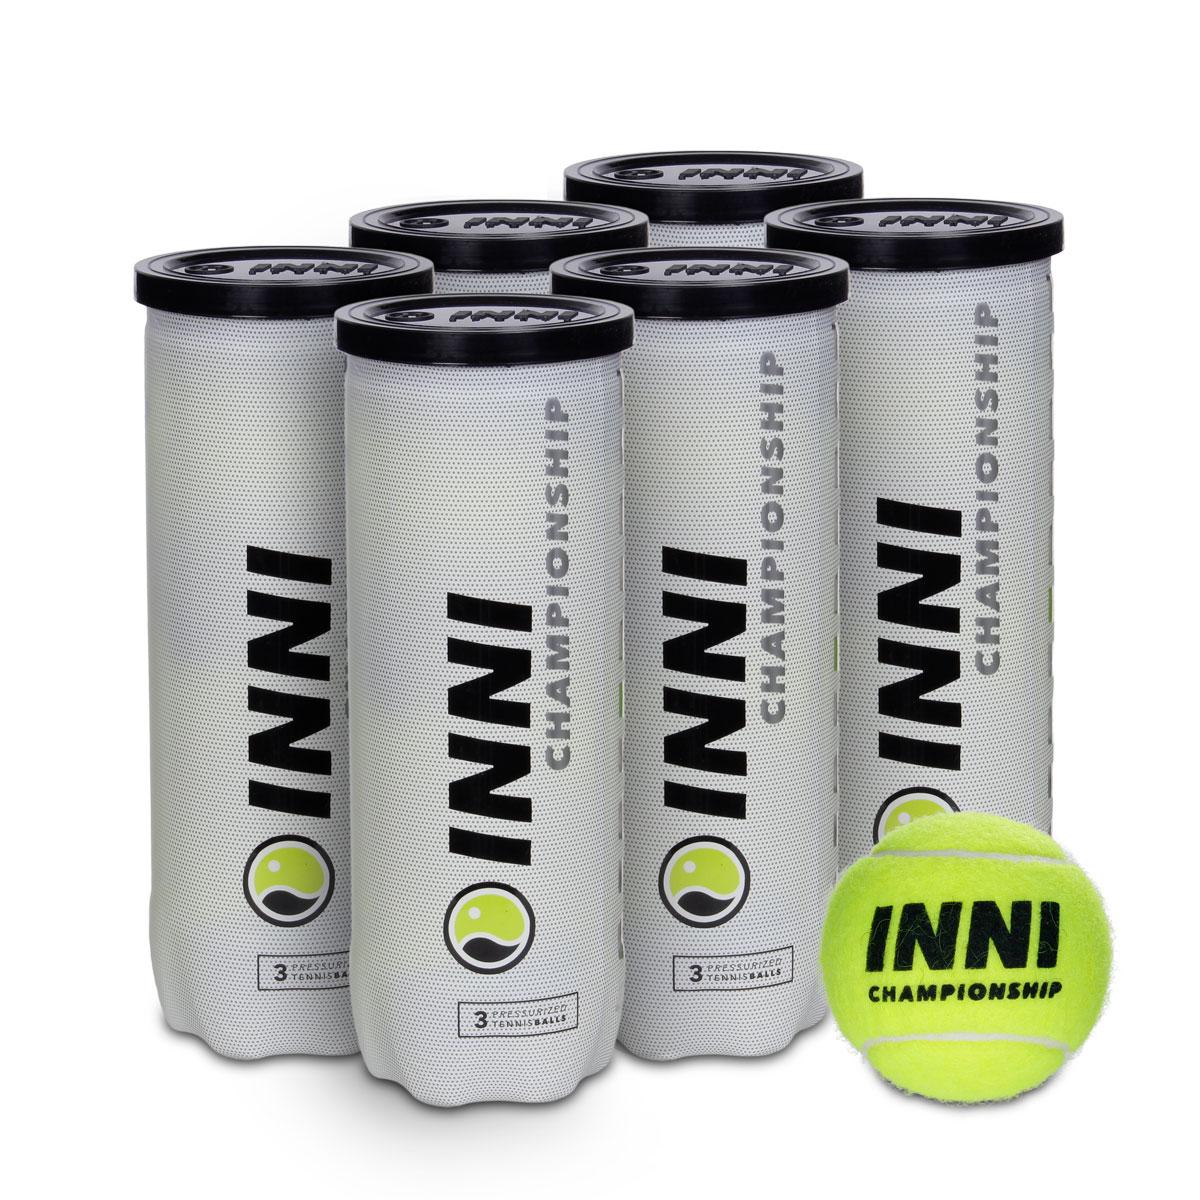 Bola de Tênis Inni Championship - Pack Com 06 Tubos